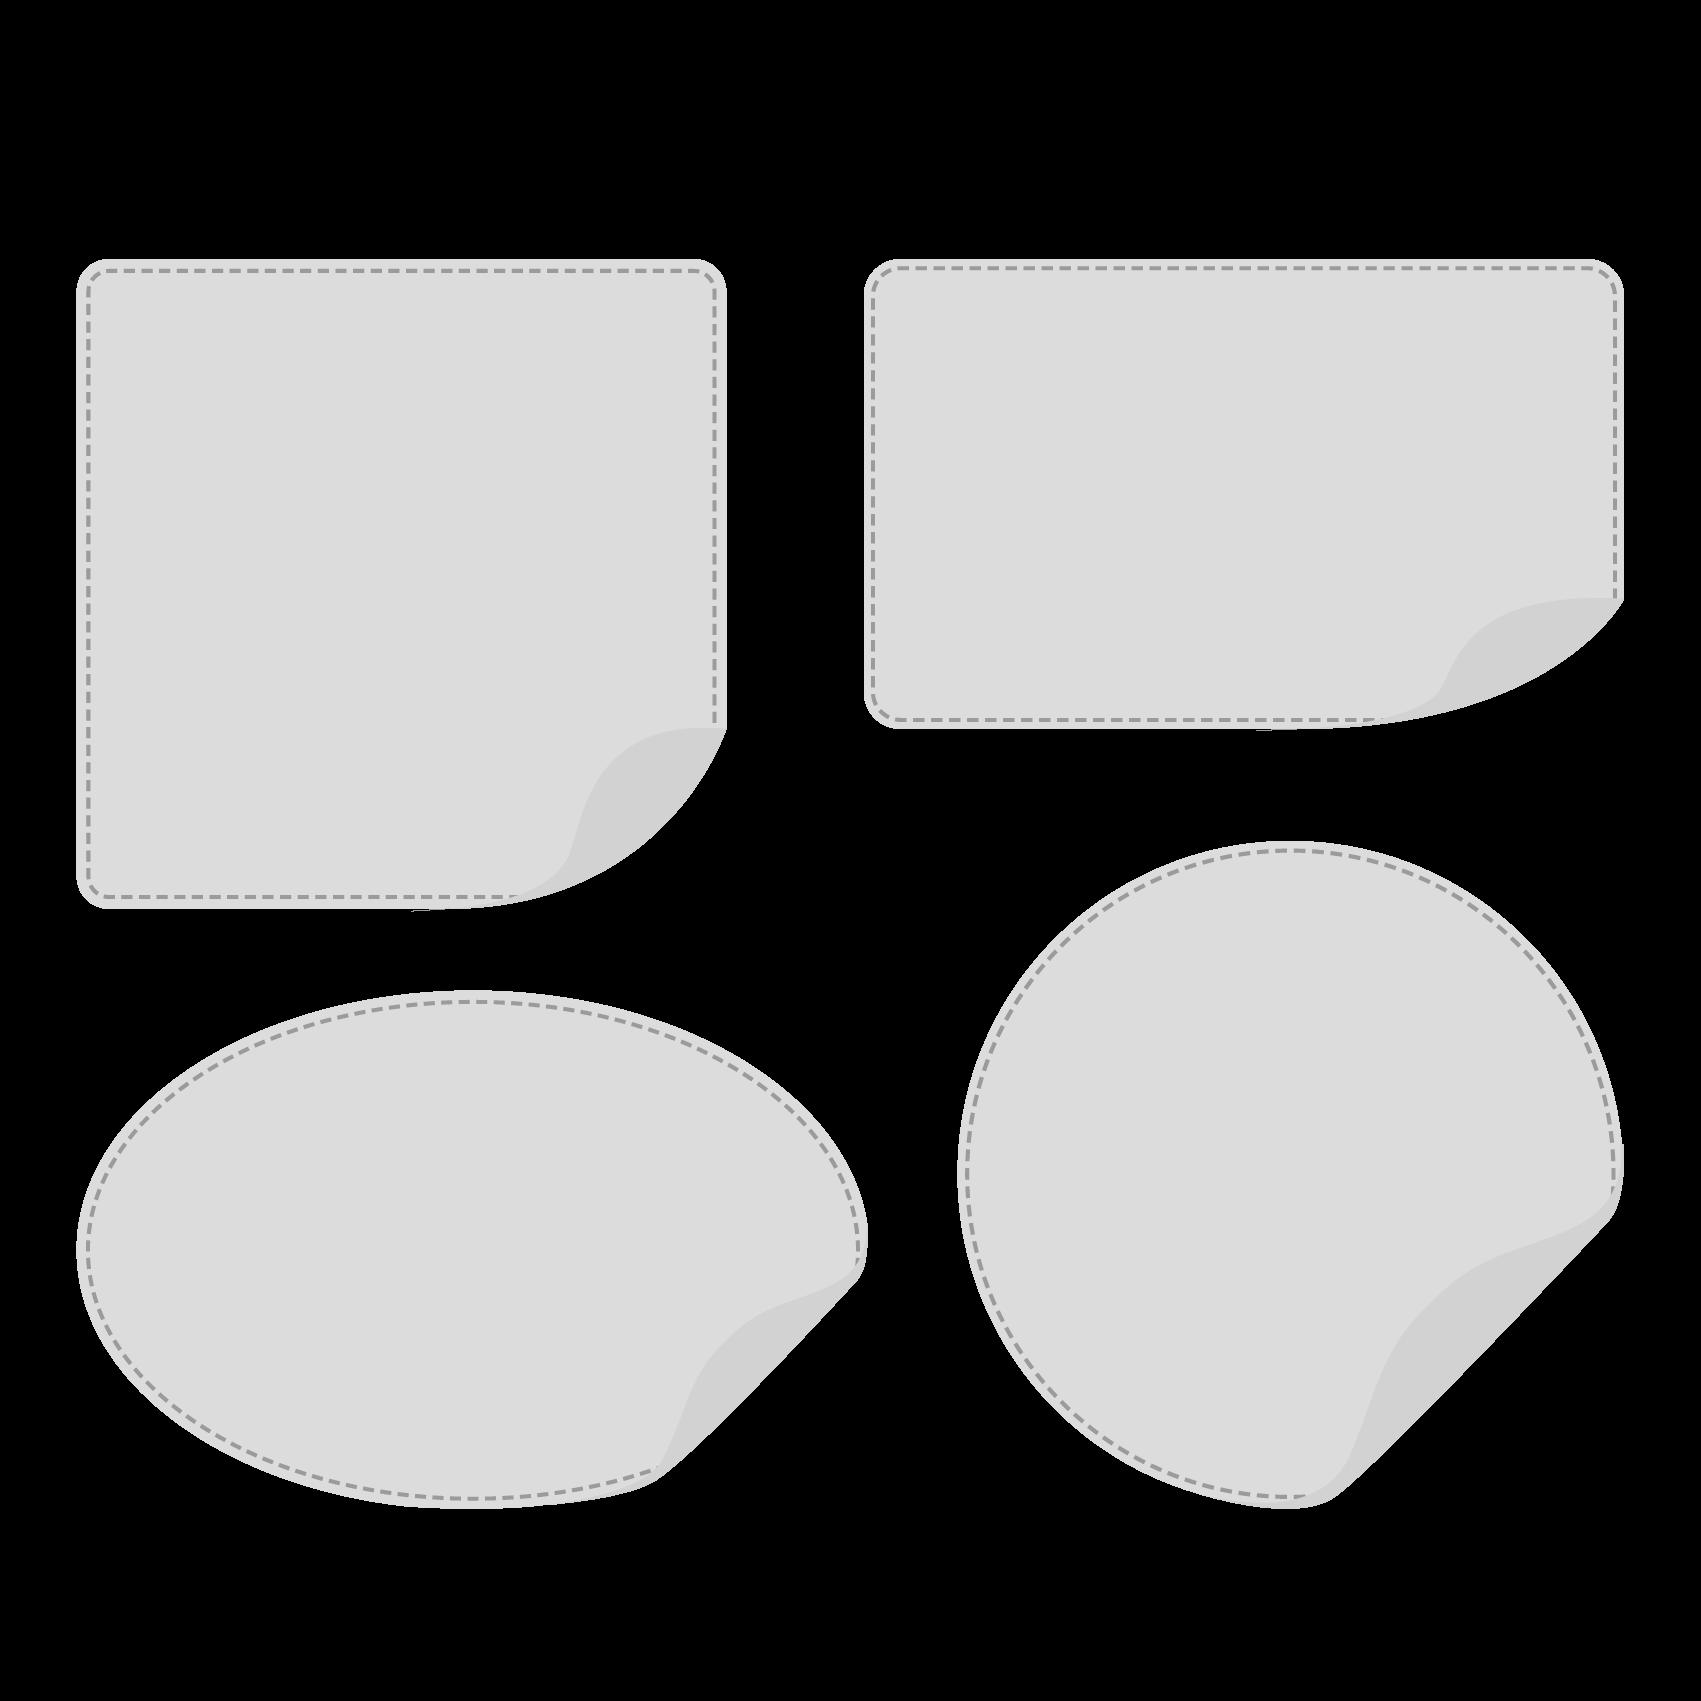 Signaal Stickers - Verschillende vormen